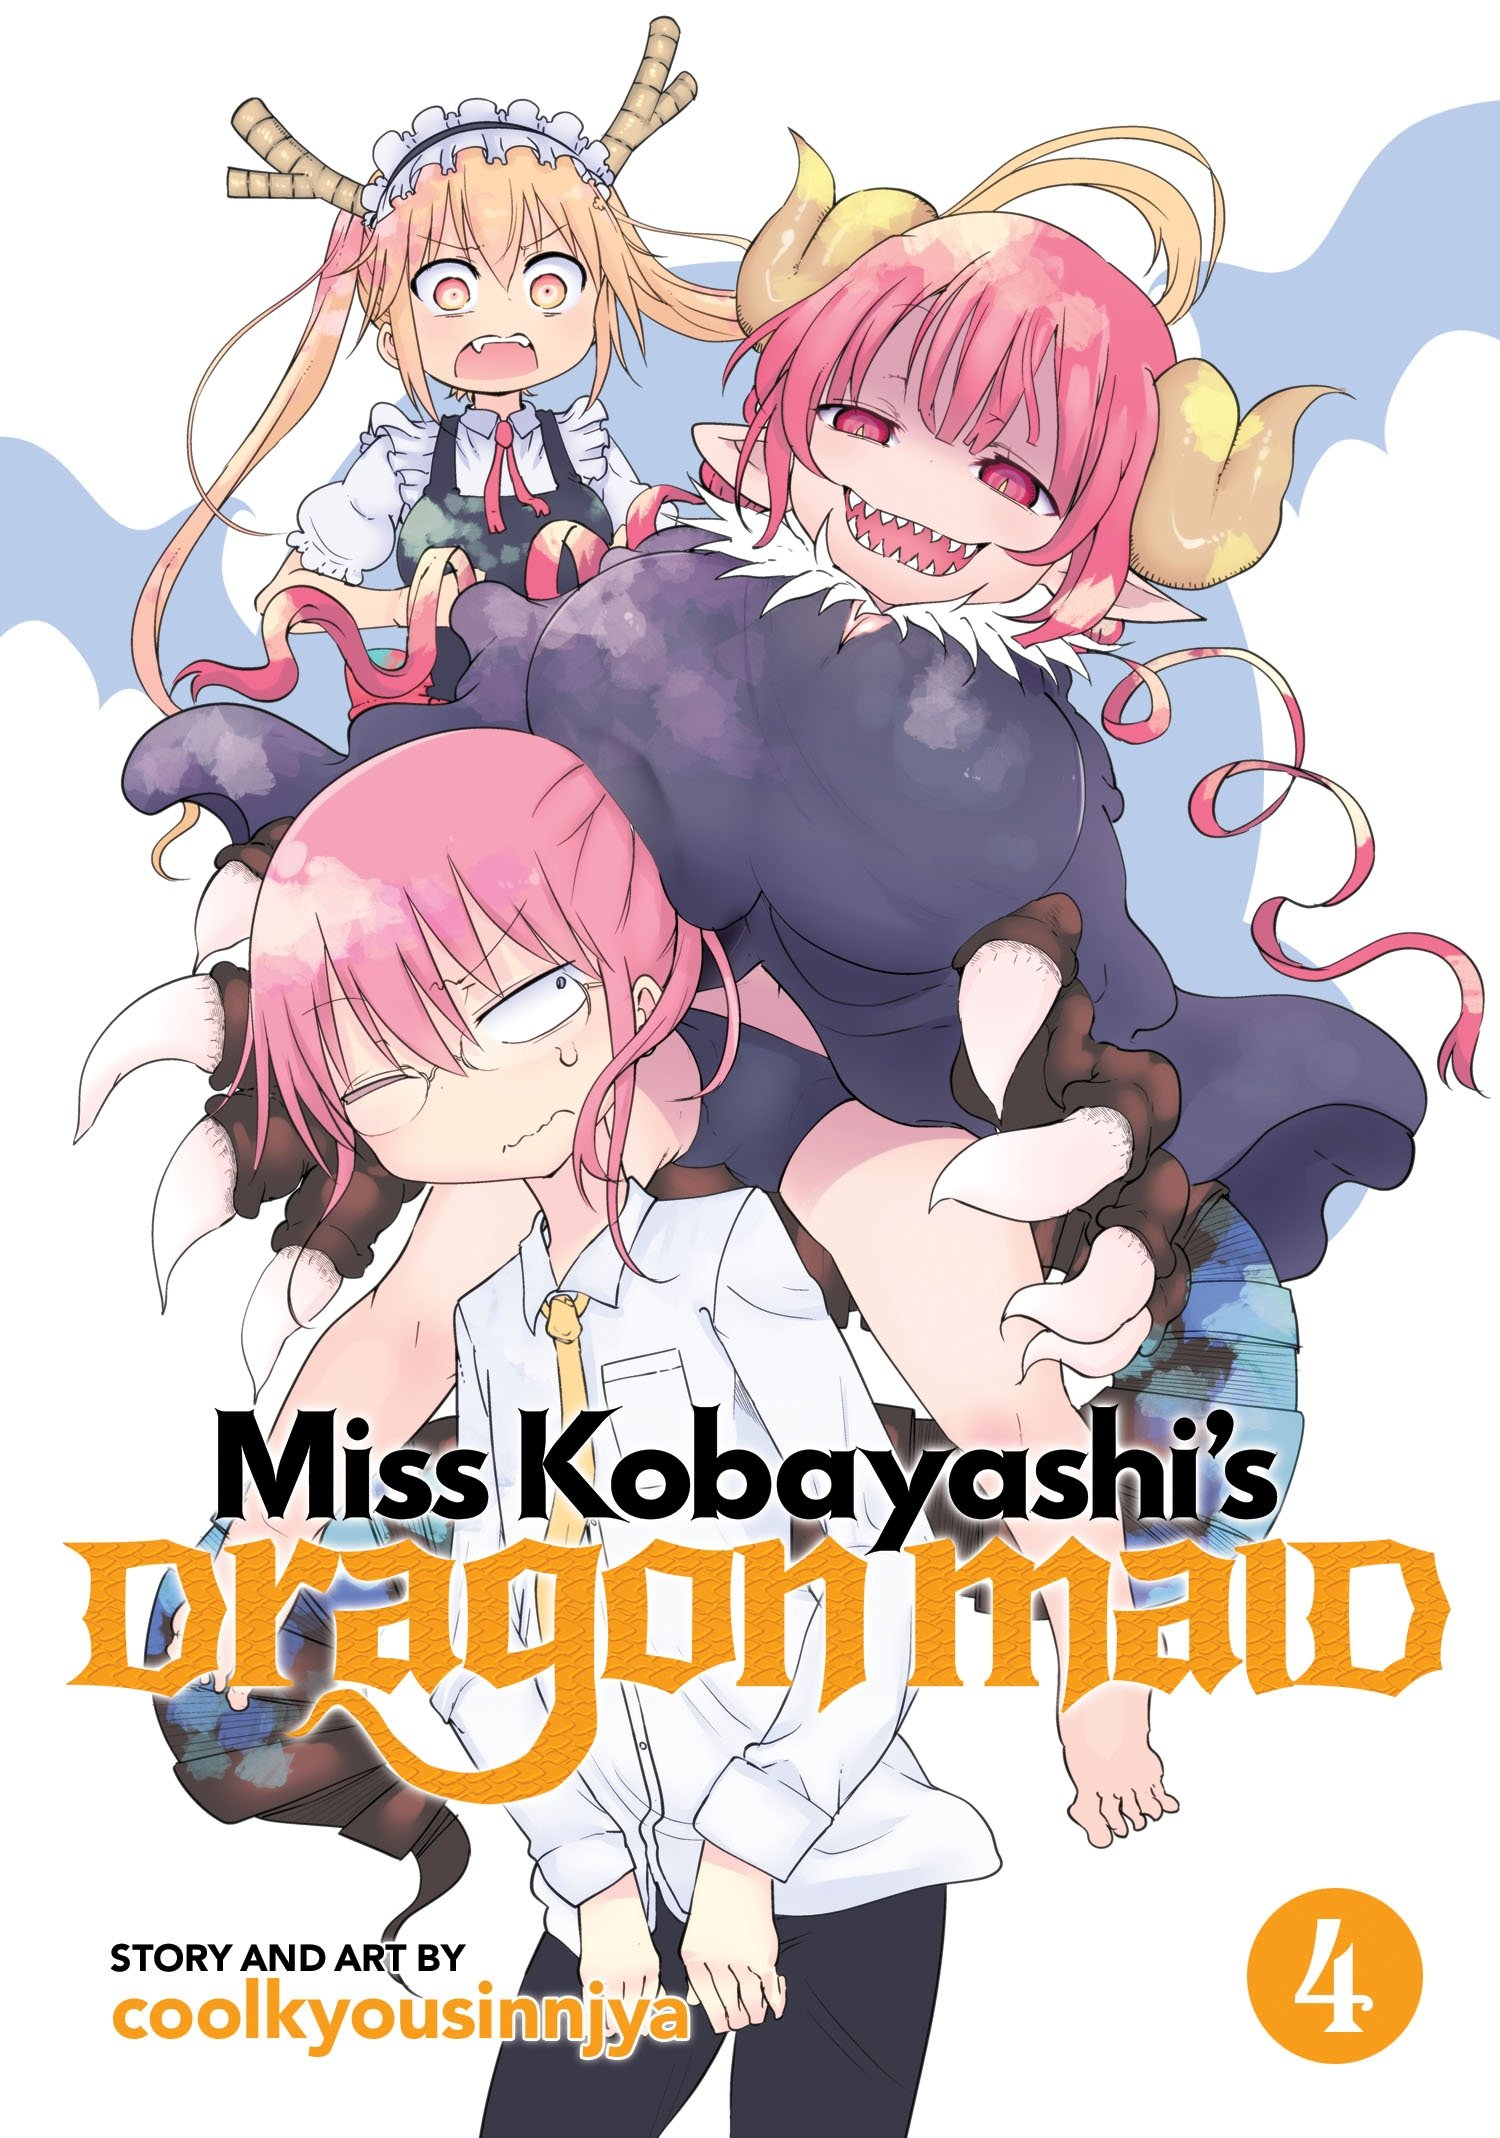 Kobayashi X Tohru Miss Kobayashi39s Dragon Maid T Miss